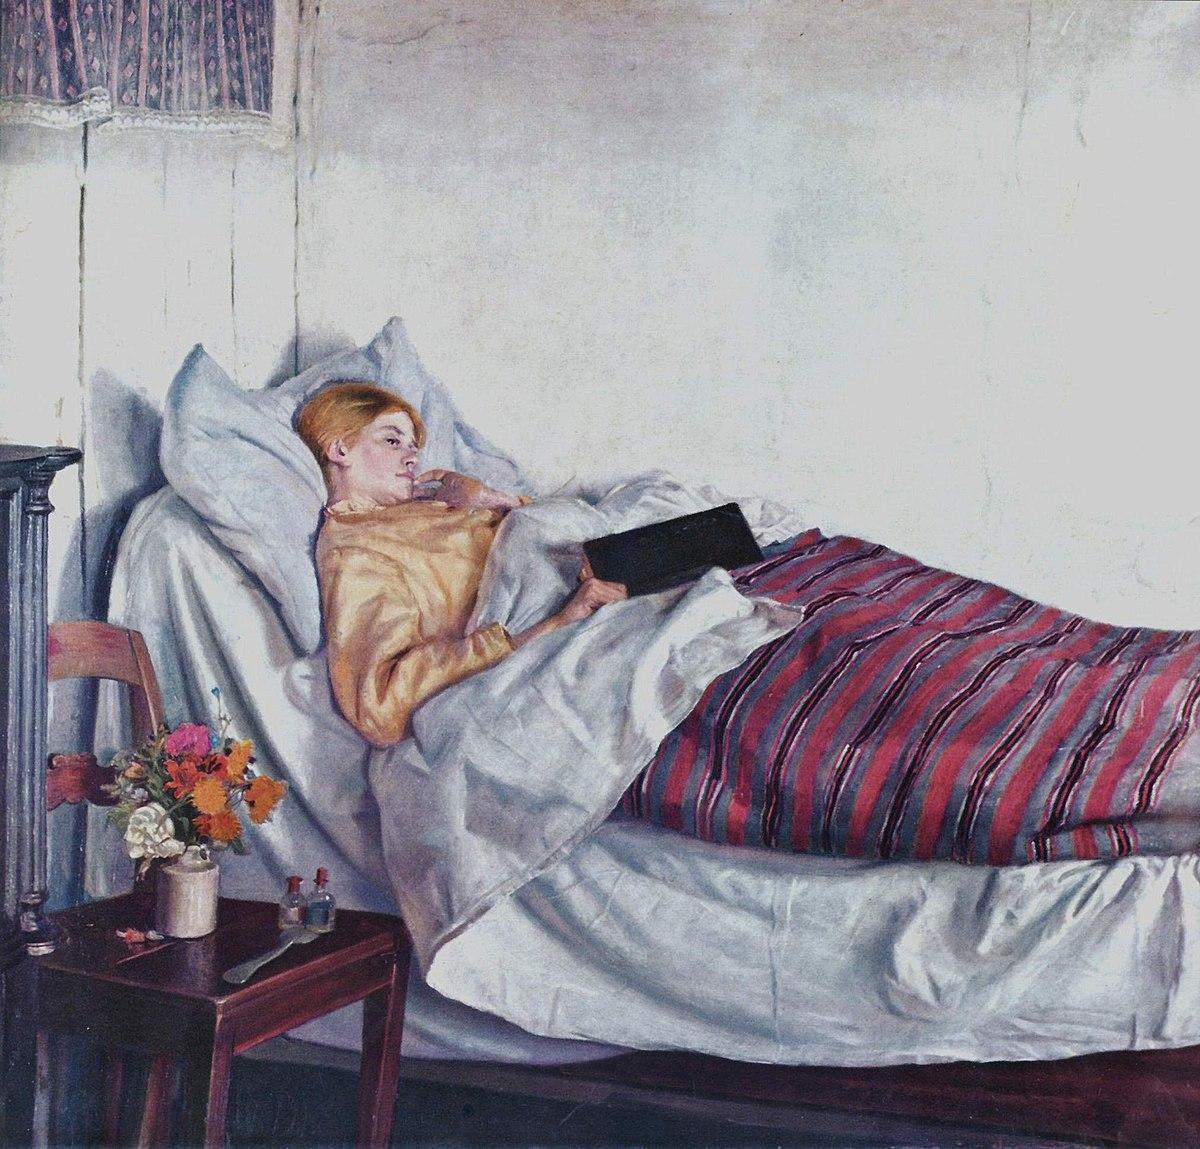 Картинки на тему болезни